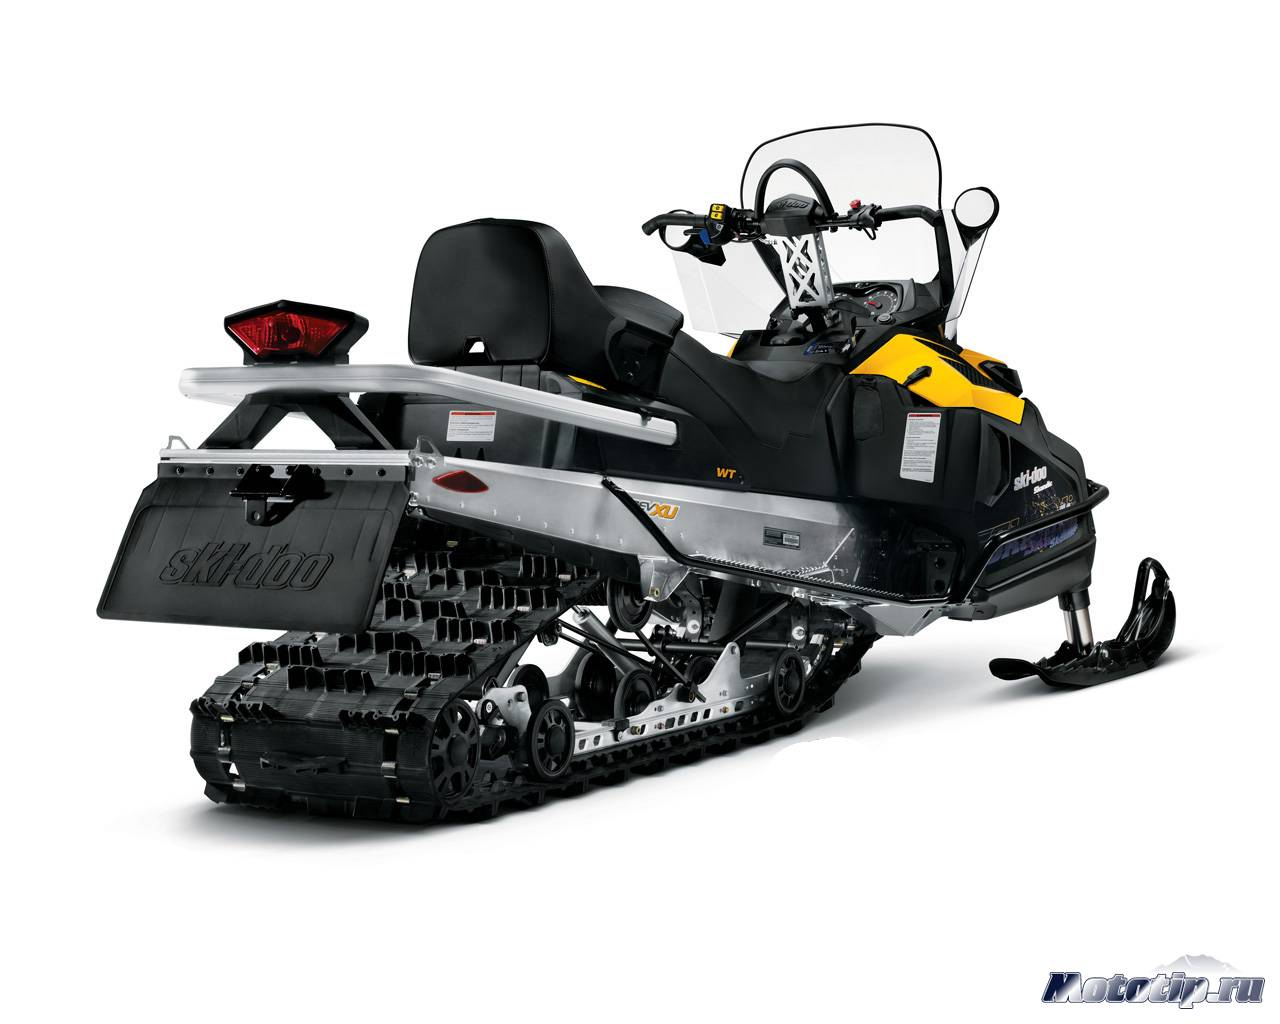 Ski Doo Skandic Wt 600 E Tec Wiring Diagram 2015 Rotax 900 Ace Pdf